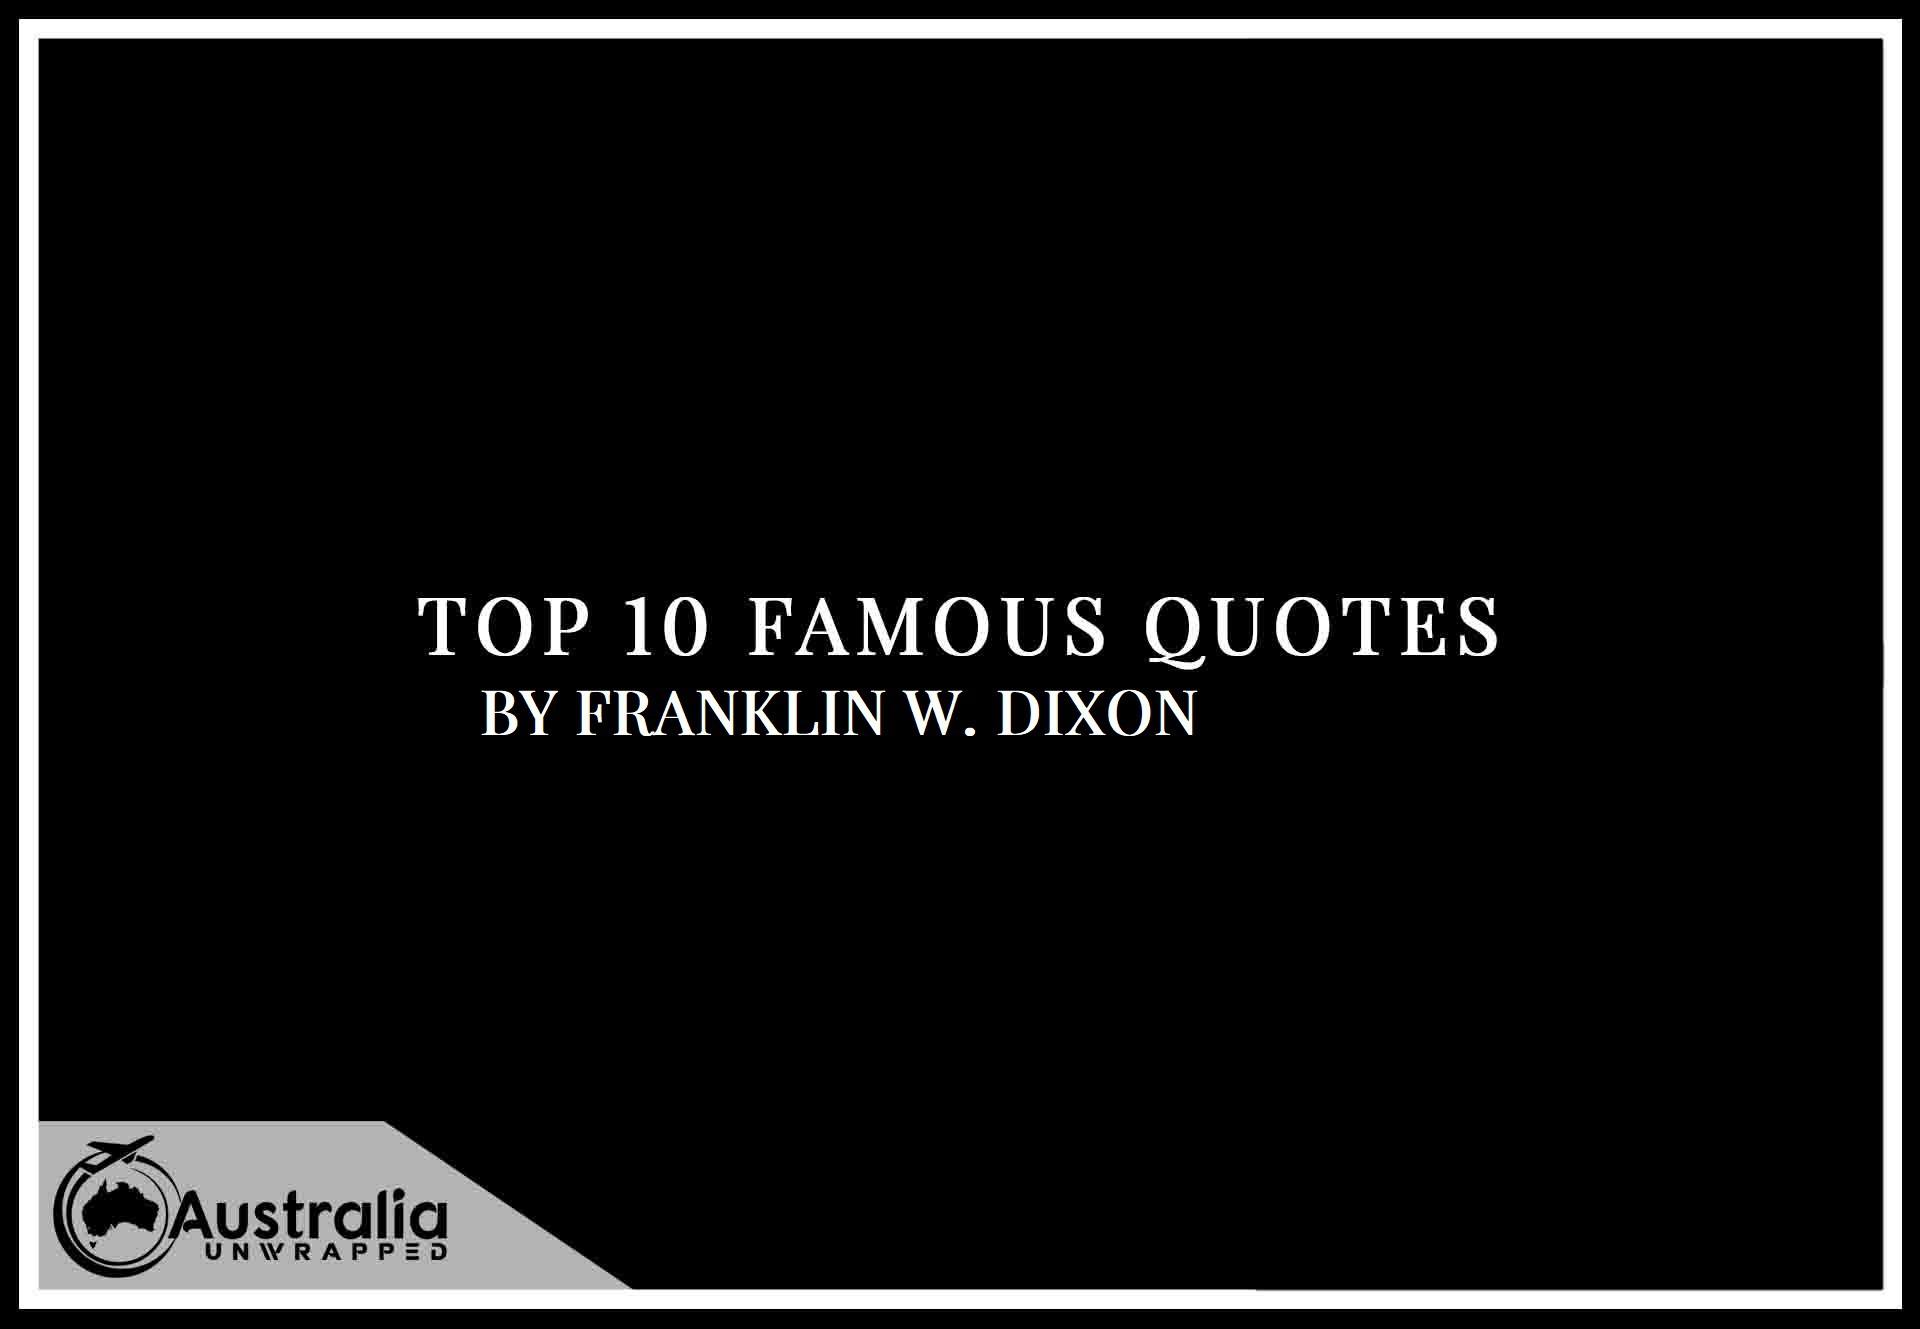 Top 10 Famous Quotes by Author Franklin W. Dixon